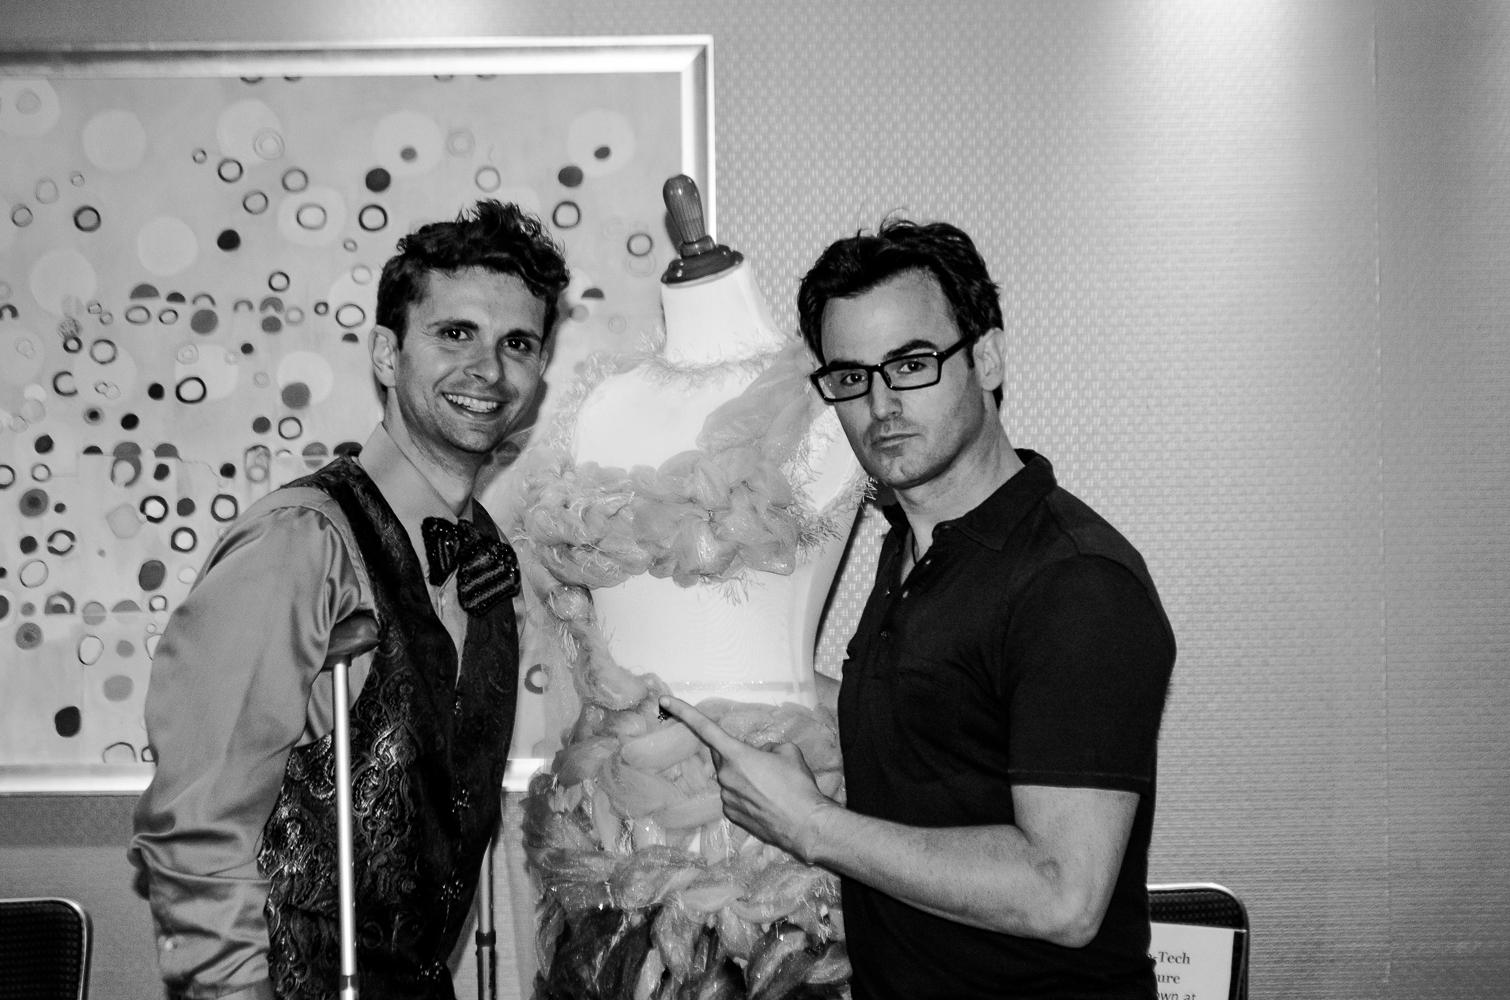 Cal con Chance Spiessbach da Chance TV per la Mostra Tecnologia Indossabile a New York Couture Fashion Week.